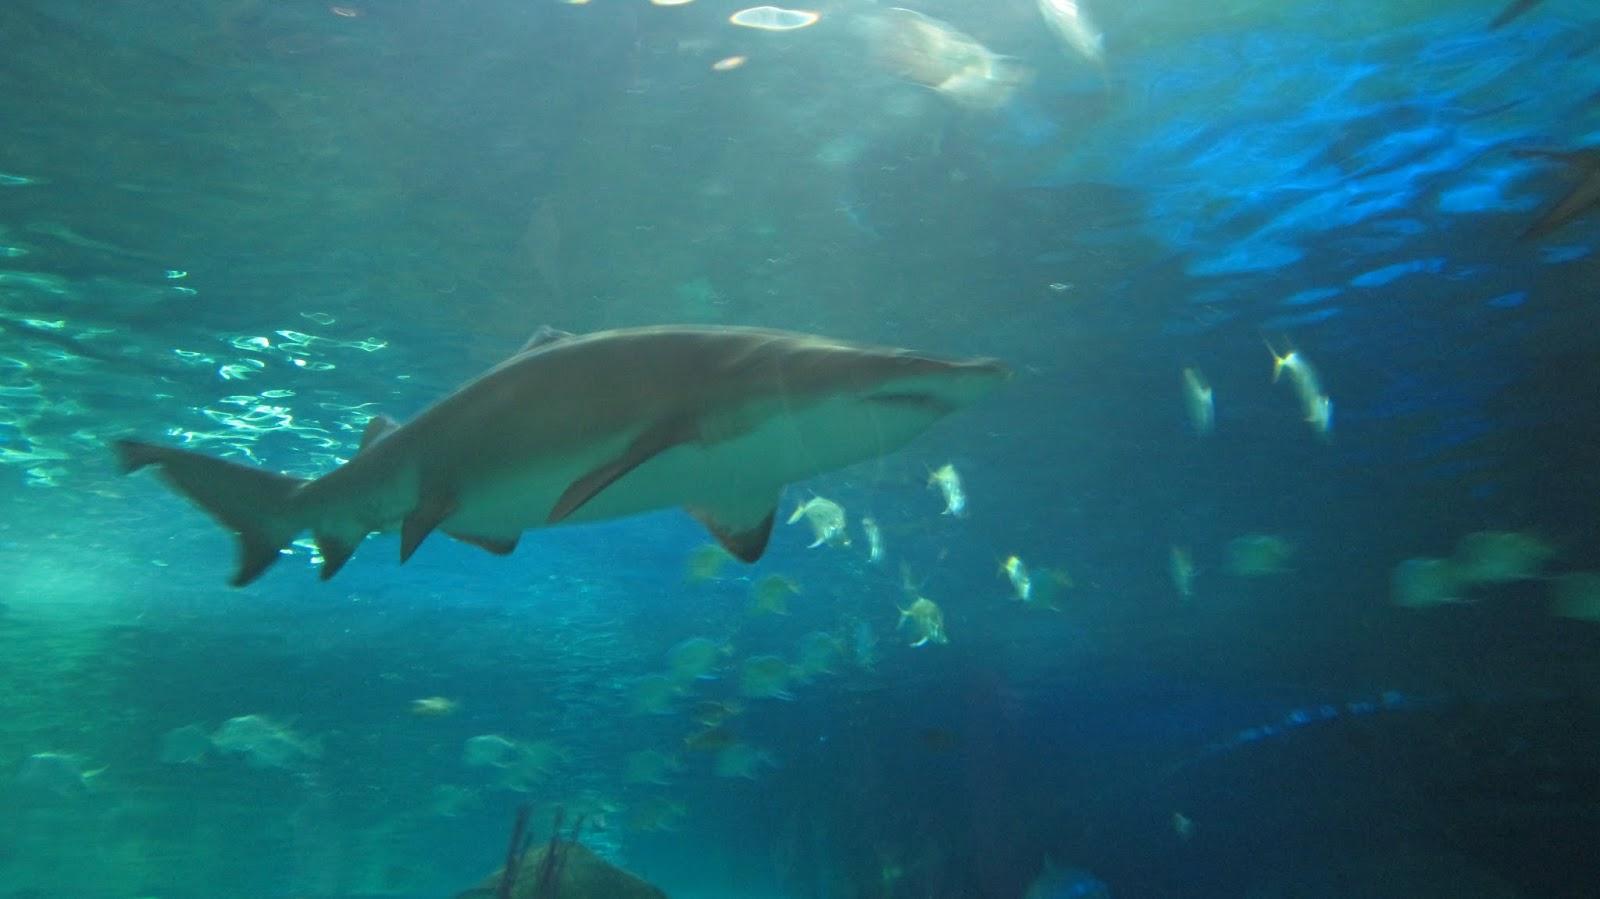 shark ripley's aquarium canada